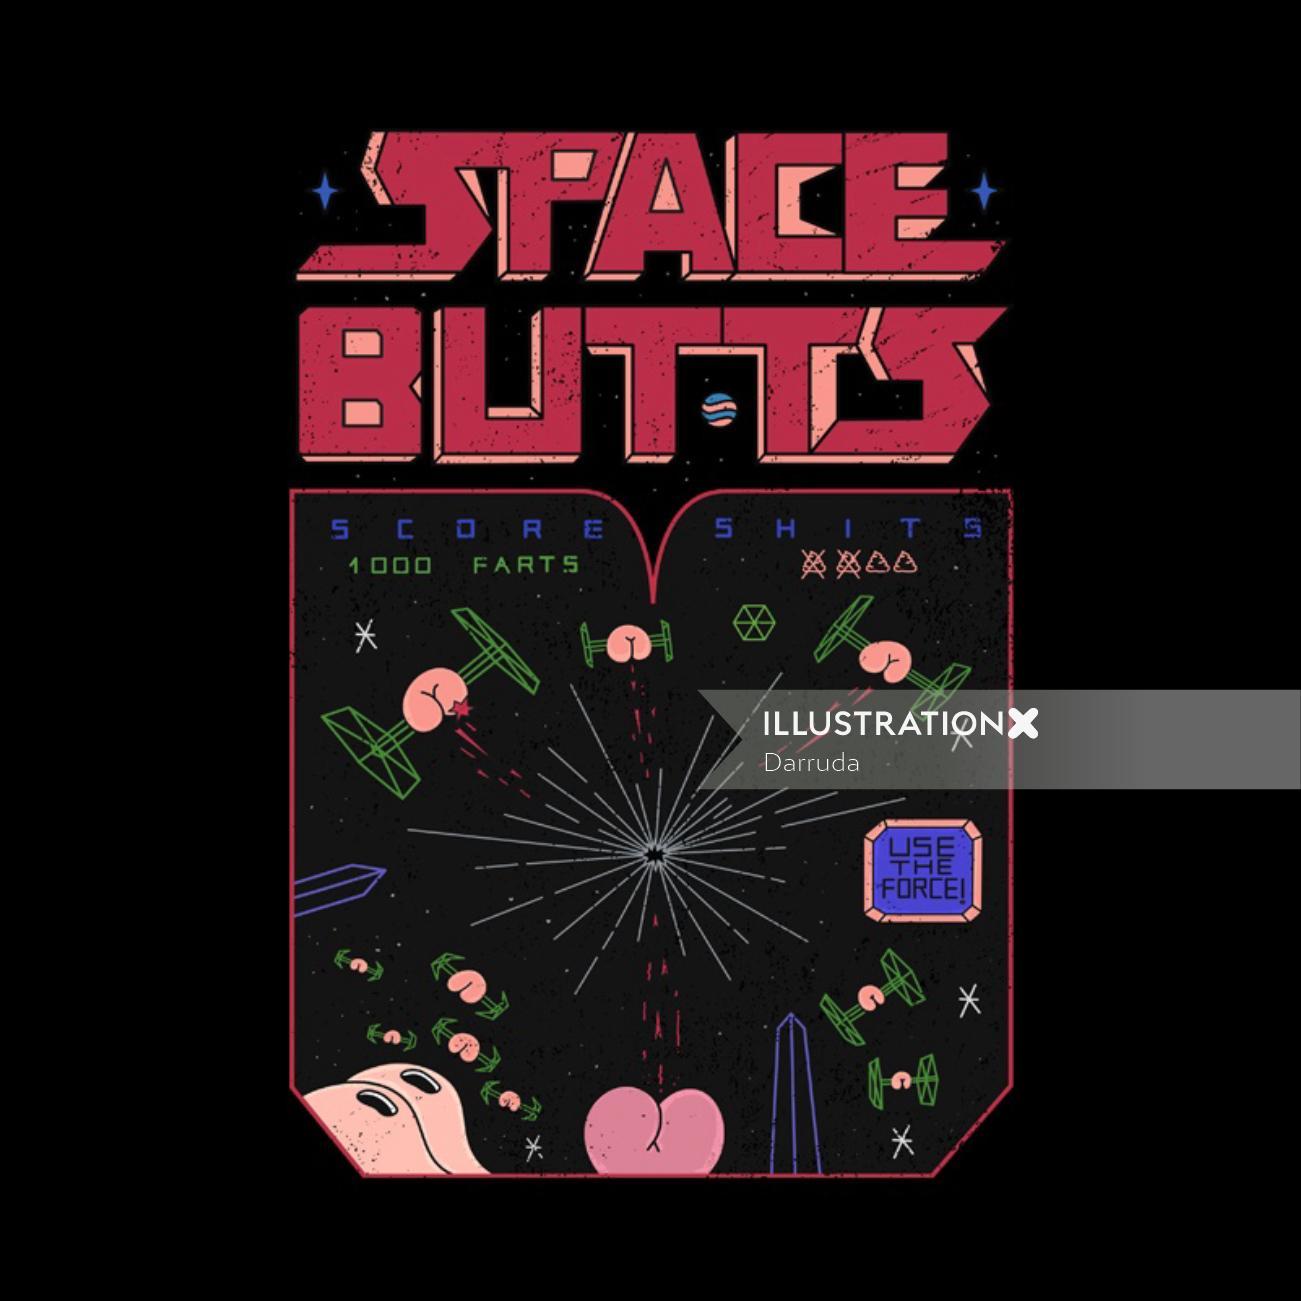 Space battle cover design by Darruda